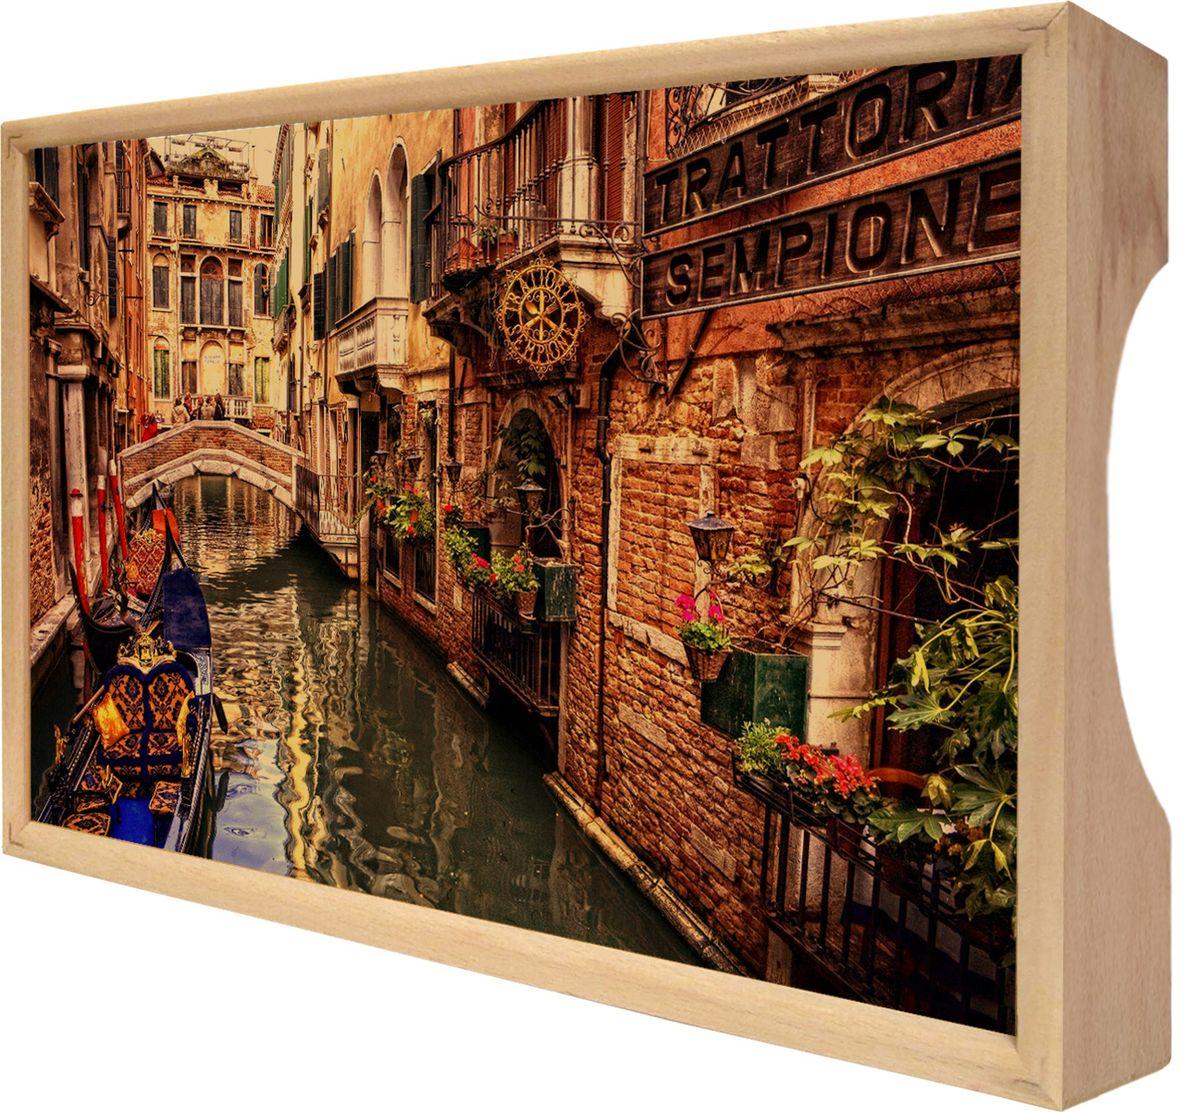 "Поднос Gift'n'Home ""Венеция"", 25 х 37,5 см"